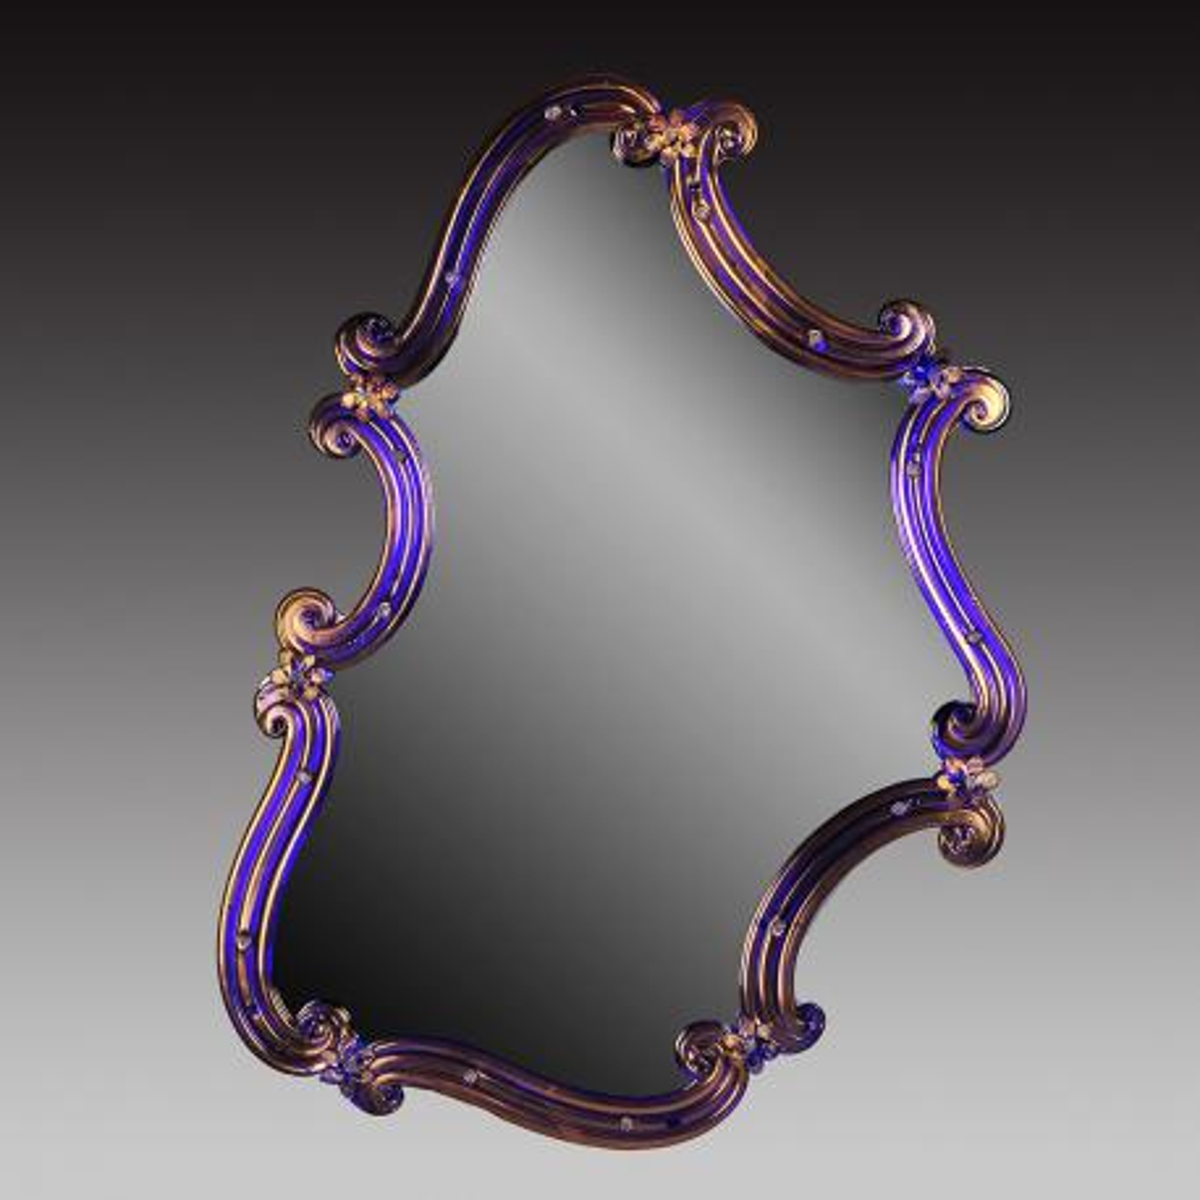 """Rosmunda blu"" miroir vénitien en verre de Murano - bleu"